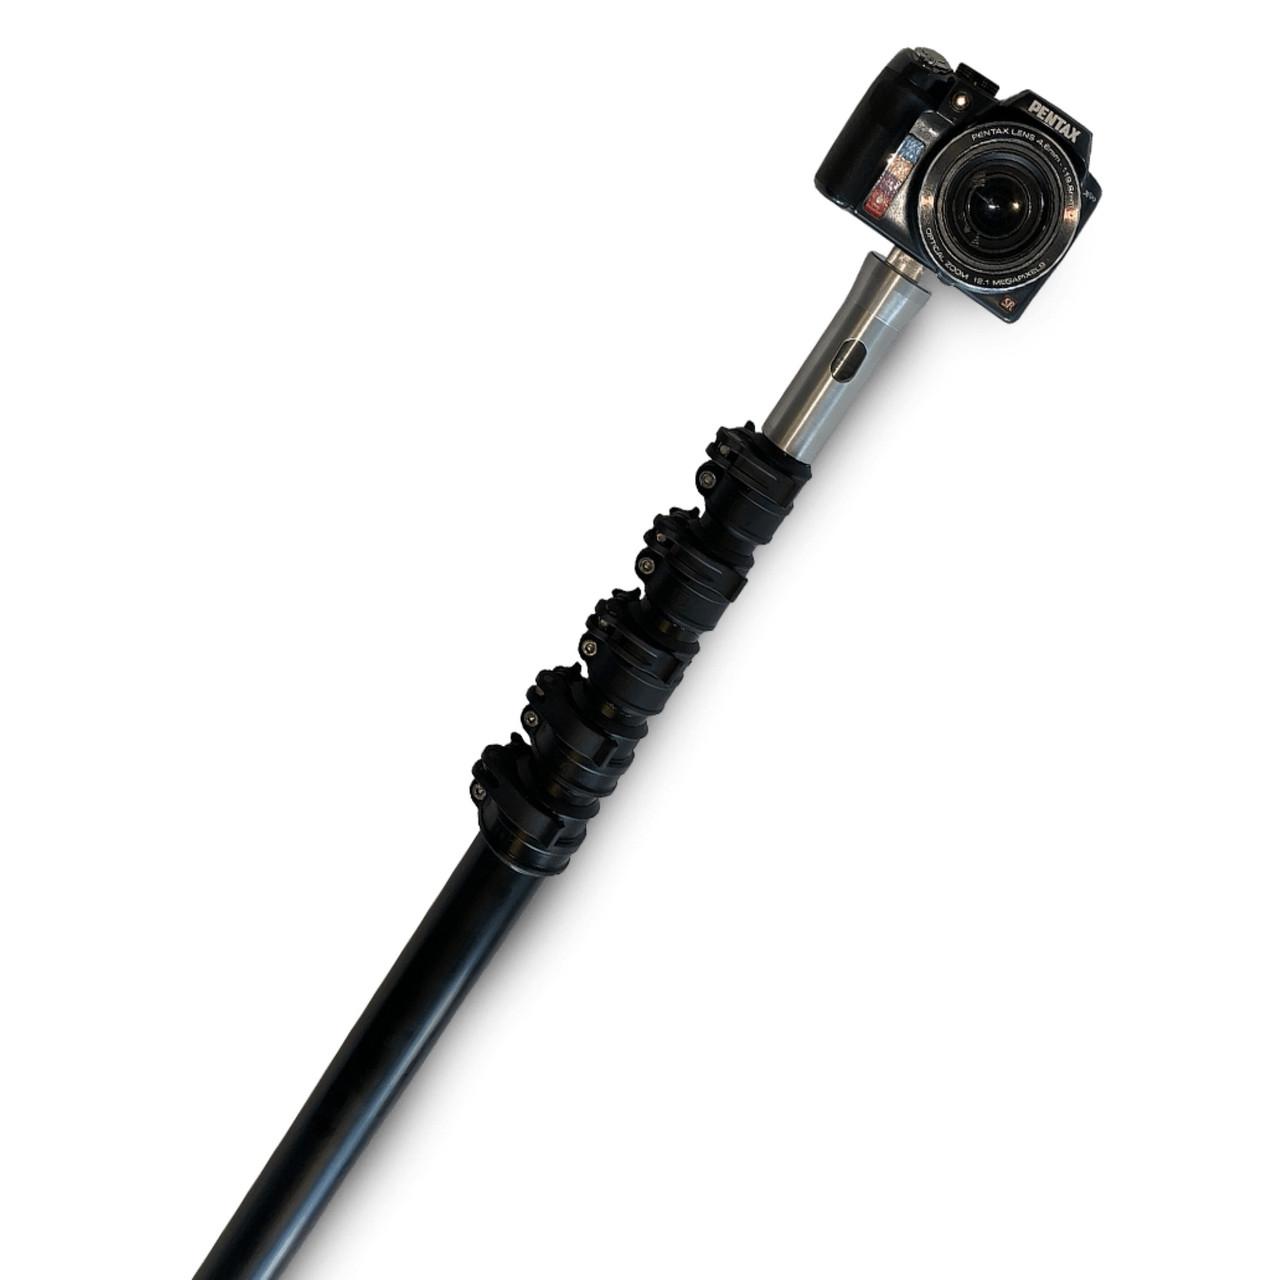 18 ft / 5.5 meters reach aluminium monopod telescopic camera pole